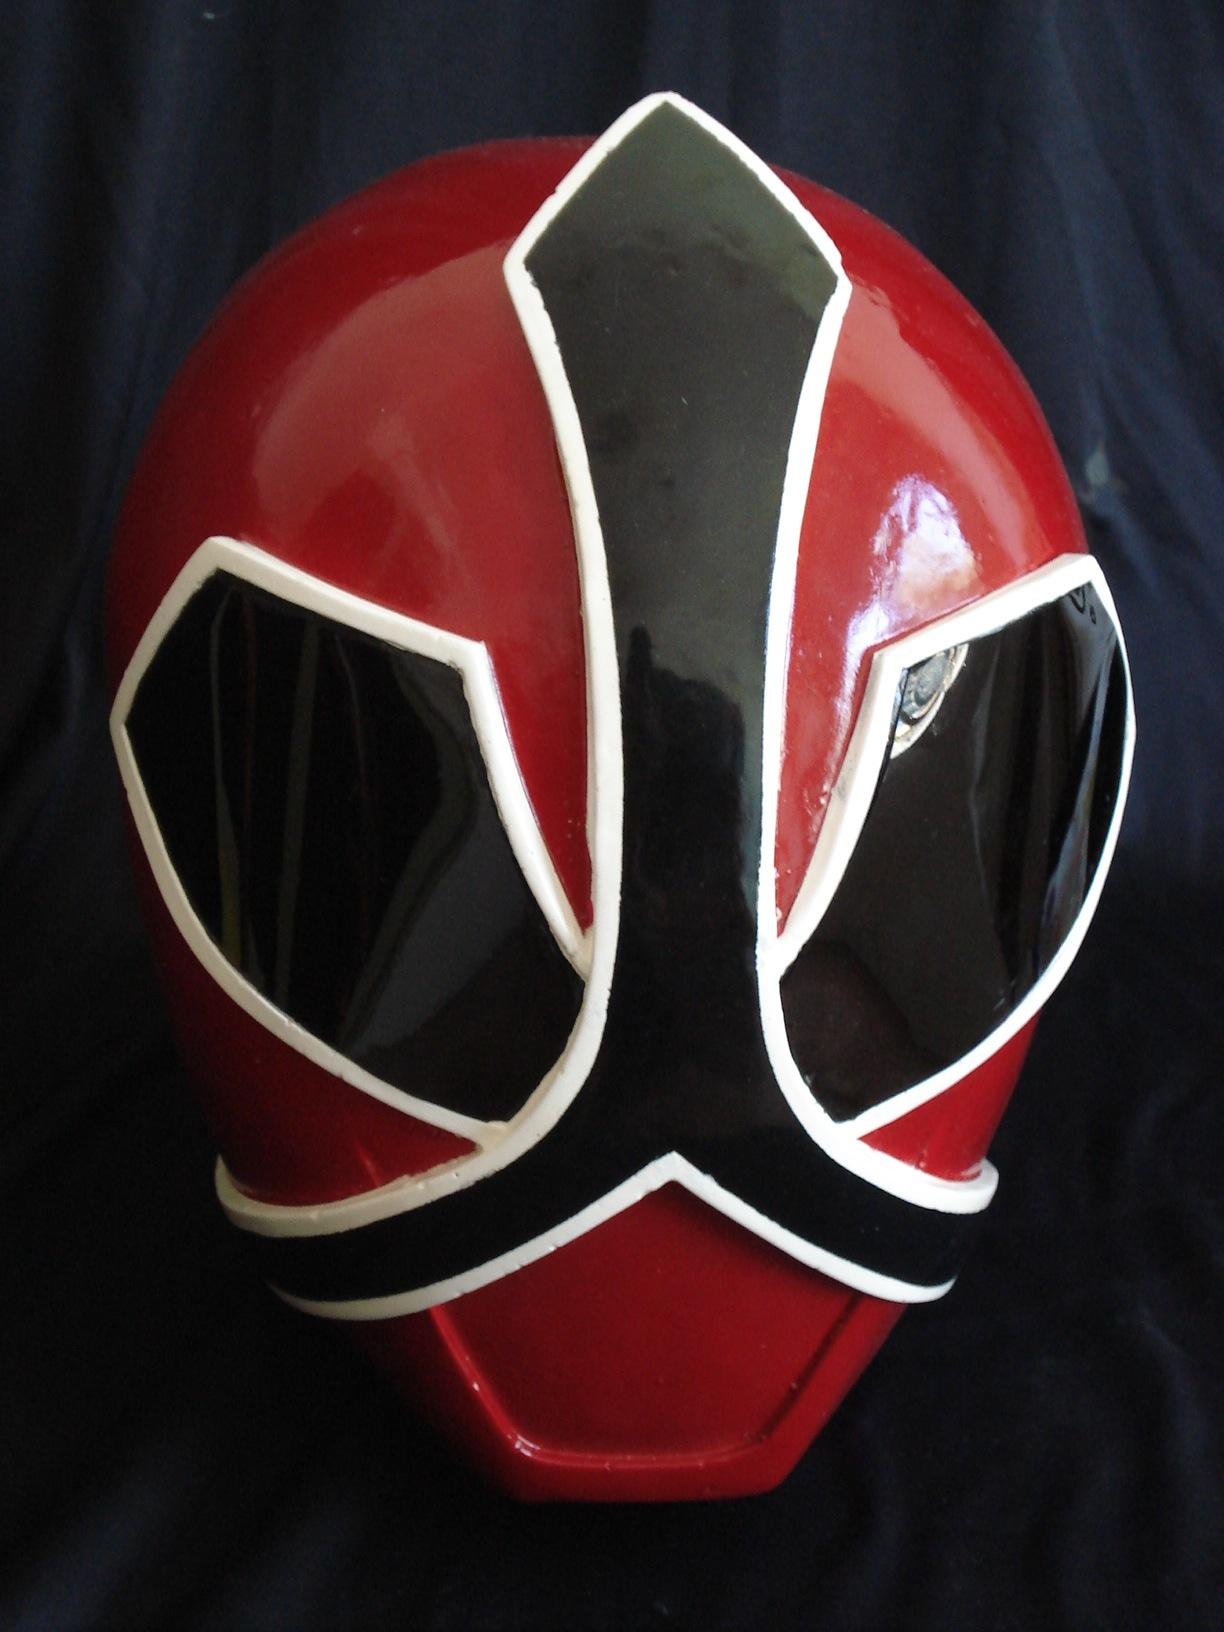 Giil shop power ranger samurai helmet 11 usable online store power ranger samurai helmet 11 usable thumbnail 3 buycottarizona